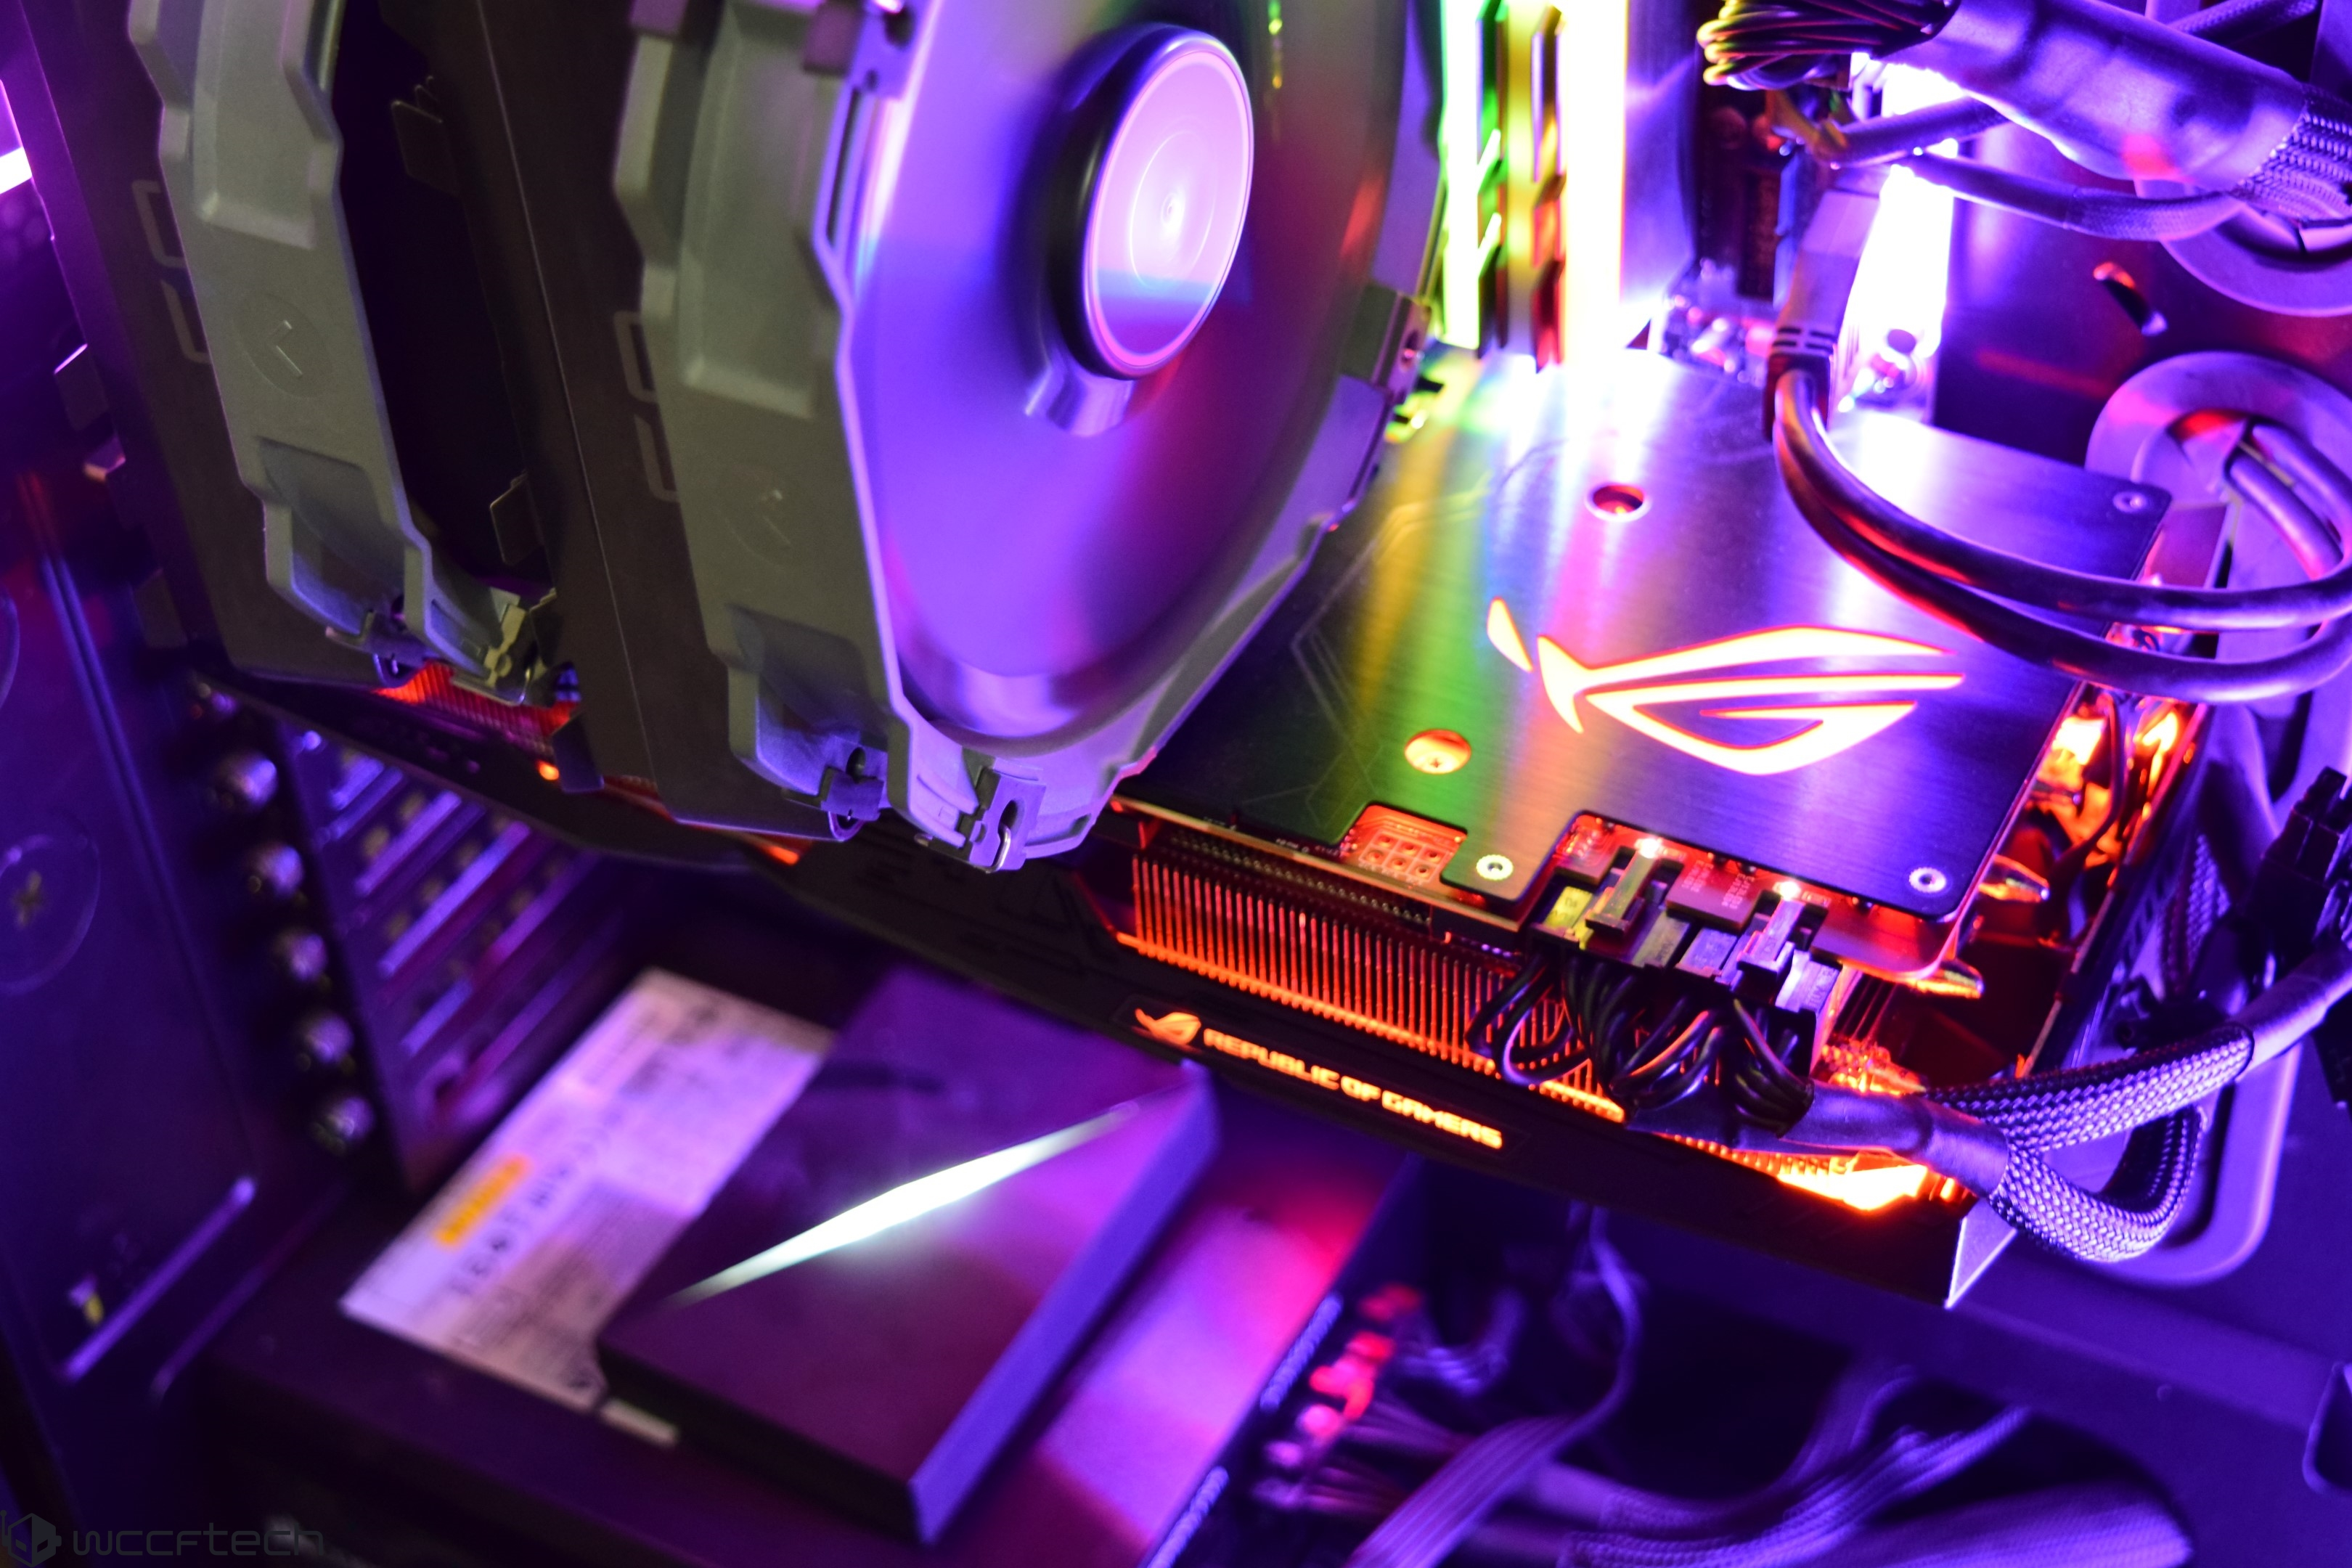 ASUS ROG STRIX GeForce GTX 1080 Ti OC 11 GB Review – When